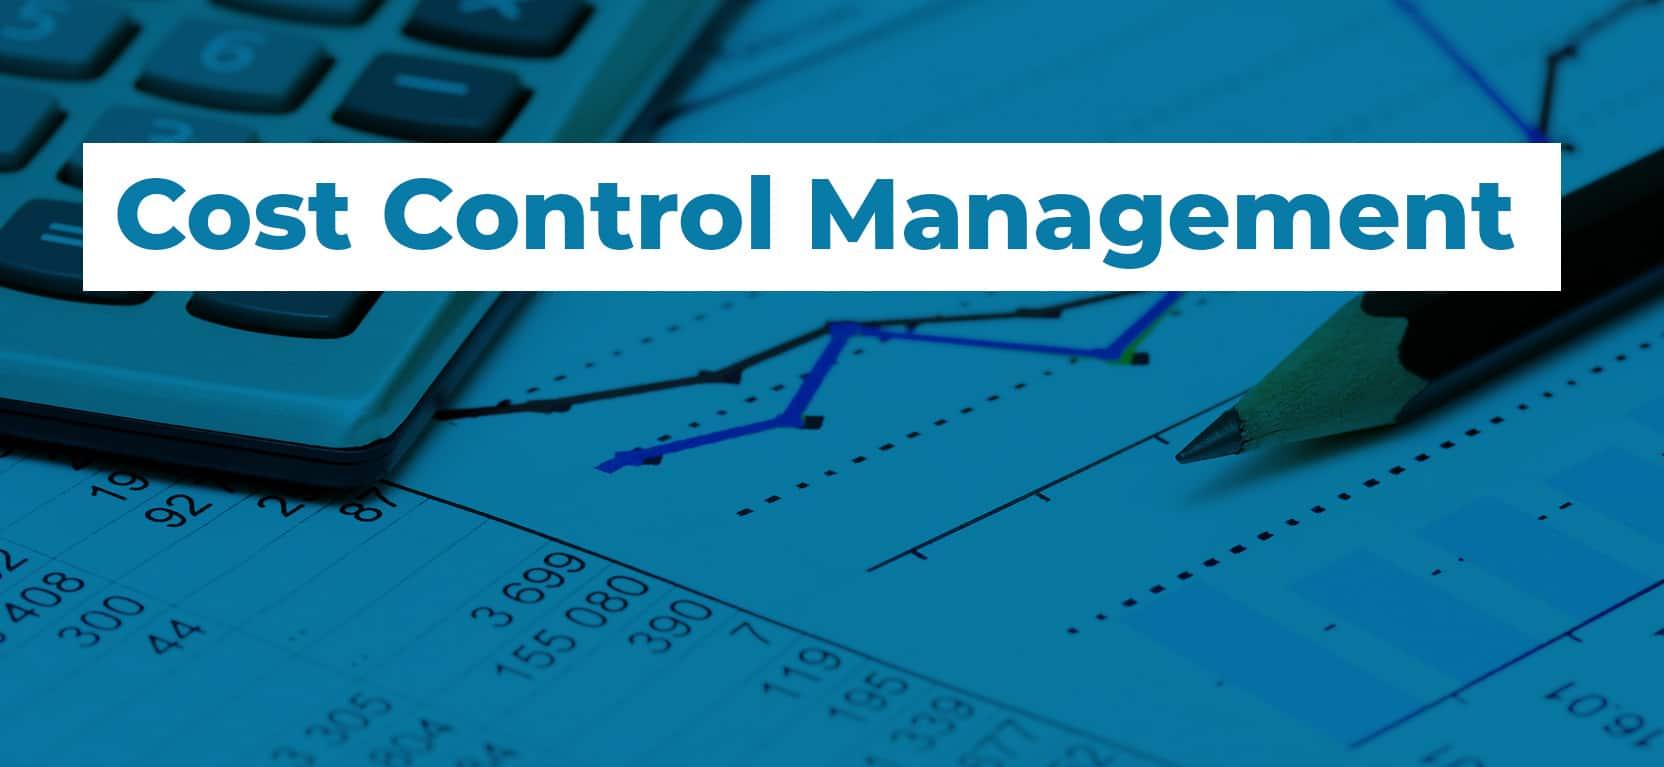 32 Cost Control Management2